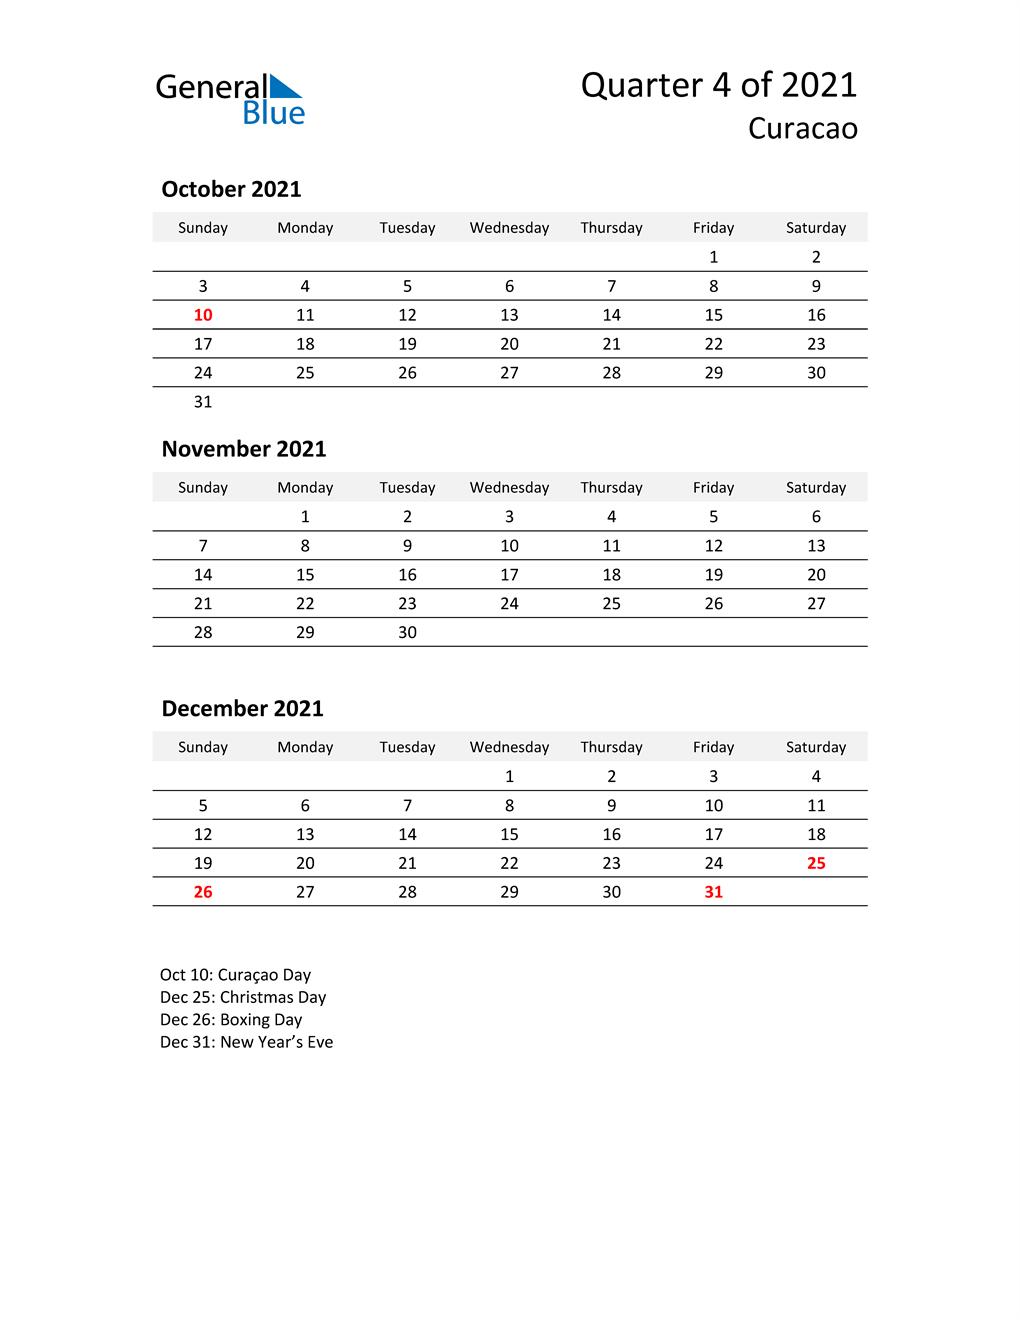 2021 Three-Month Calendar for Curacao